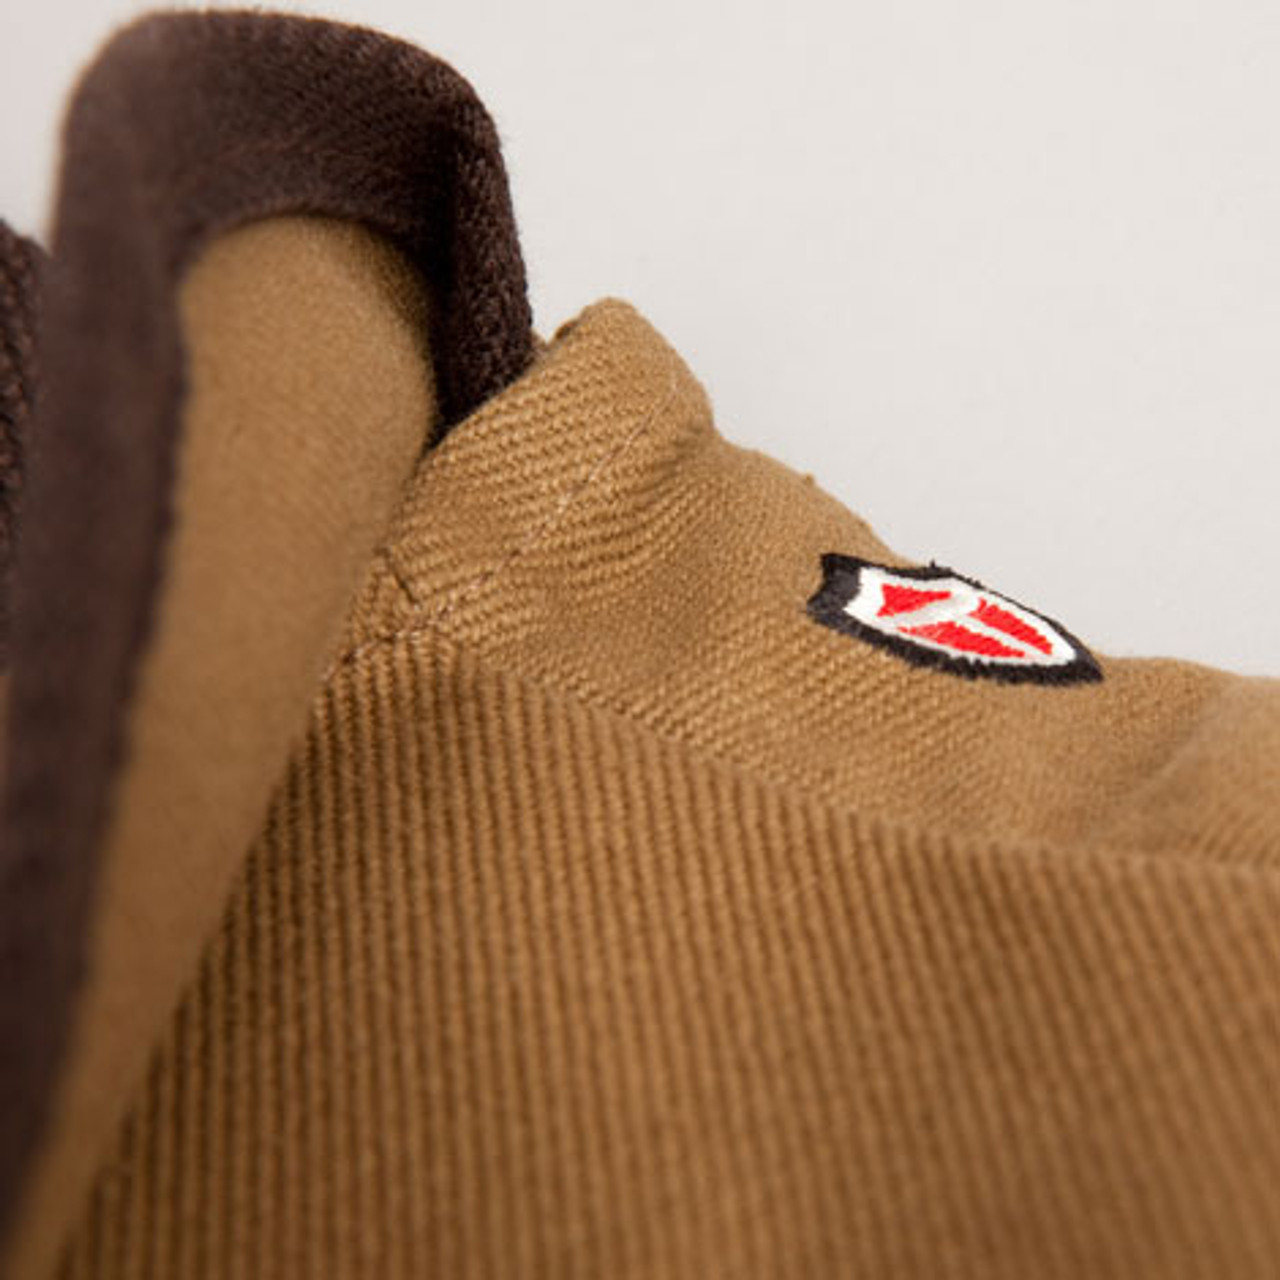 Canada Field Patch Shoulder Bag